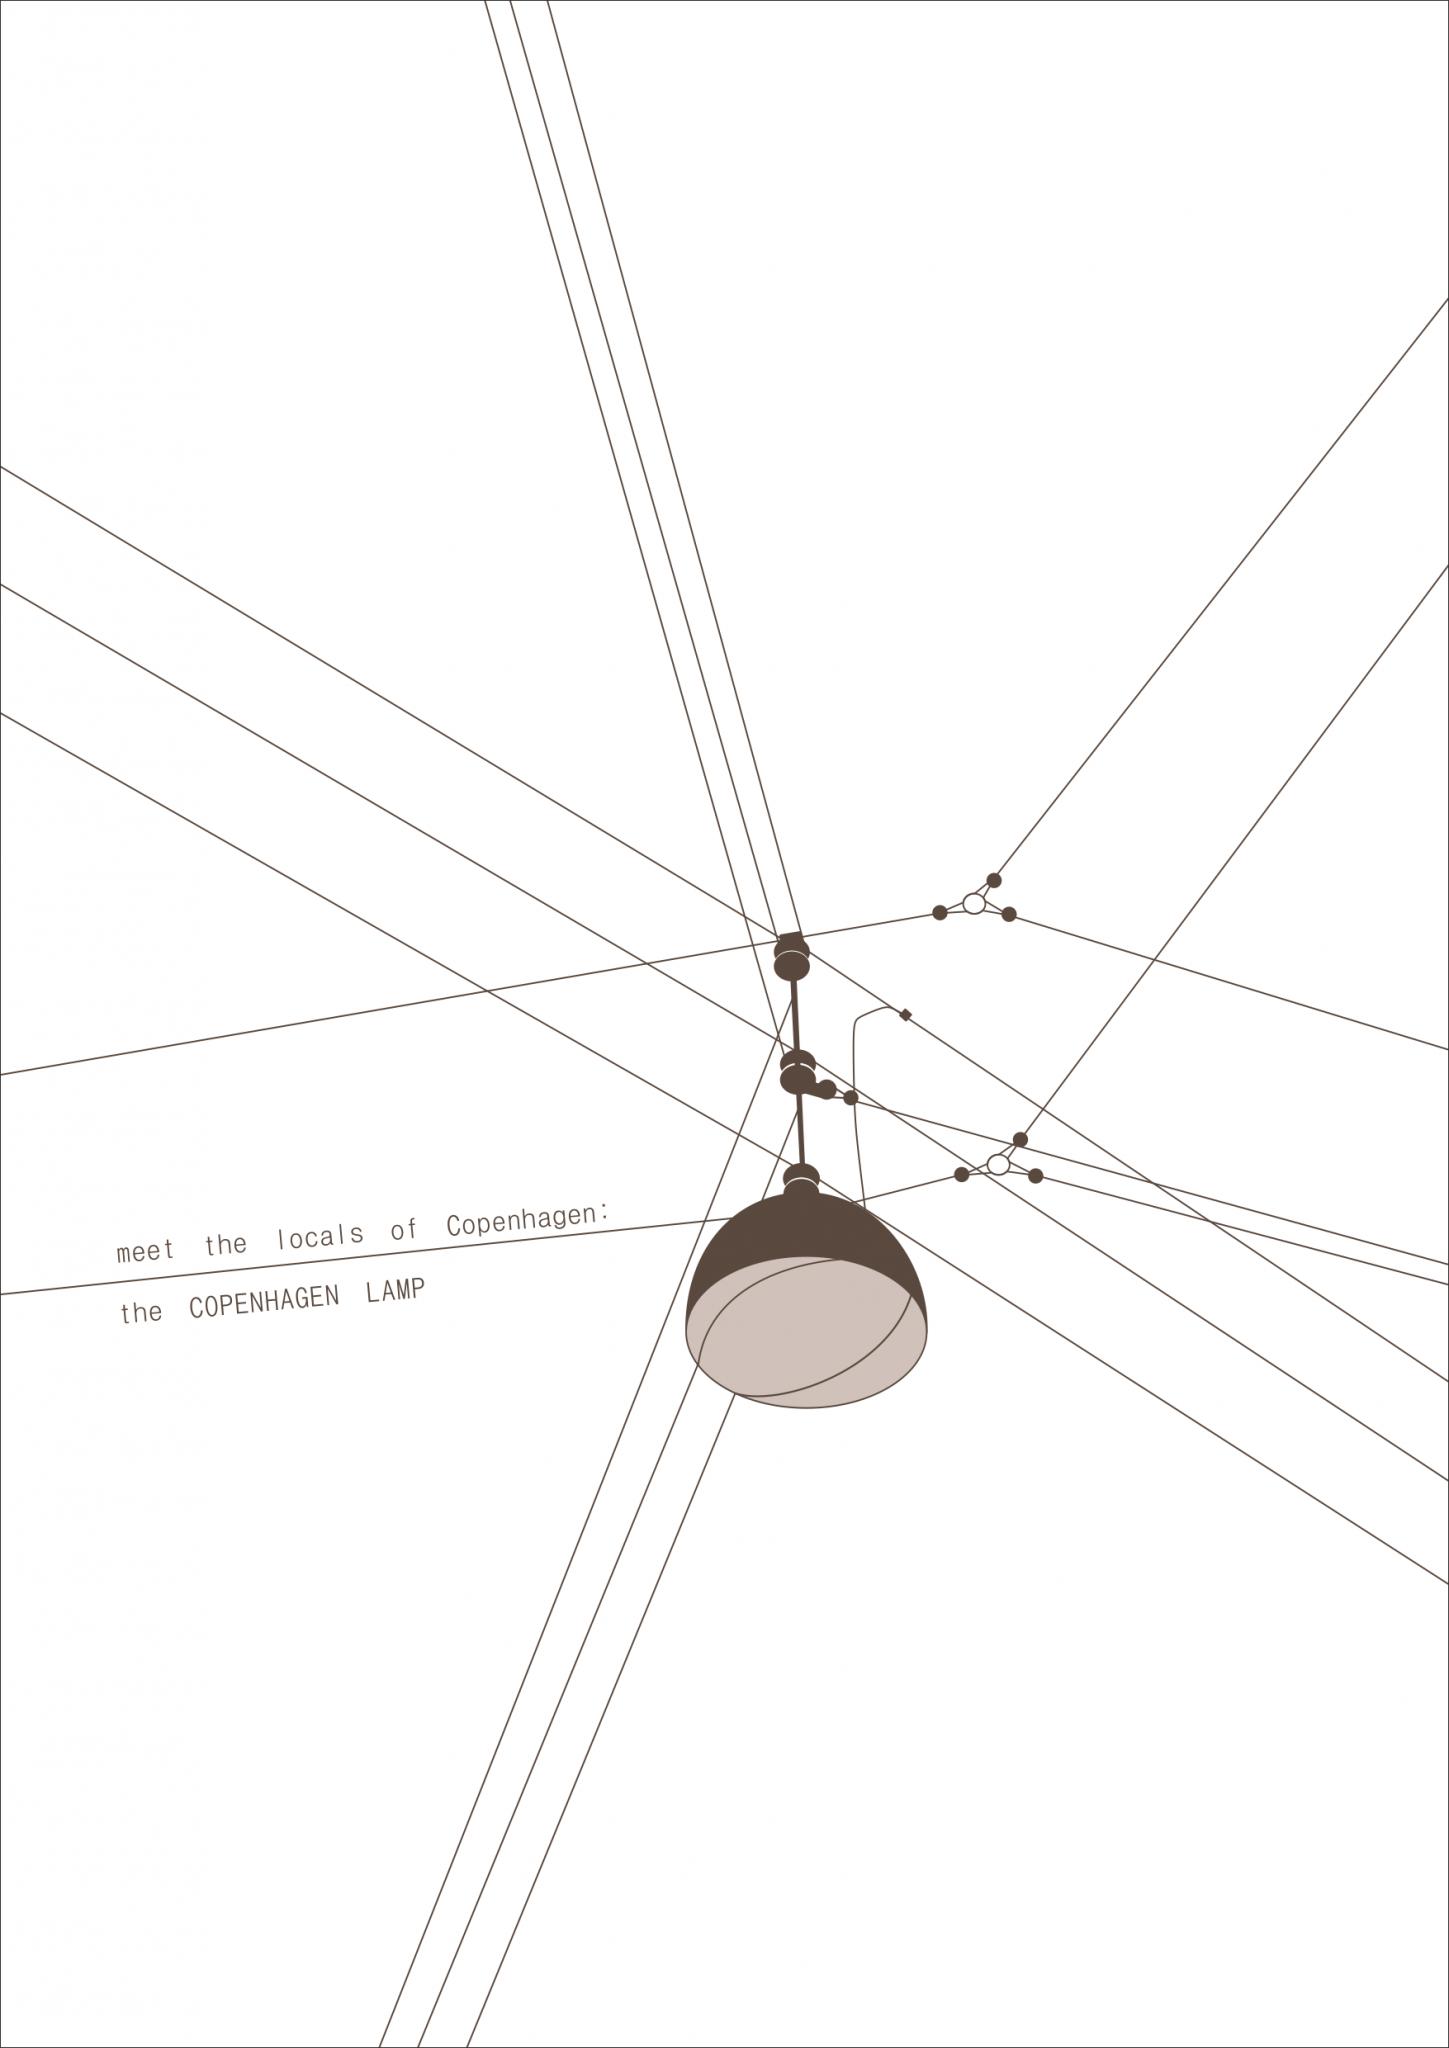 kunst-hamide-koebenhavnerlampe